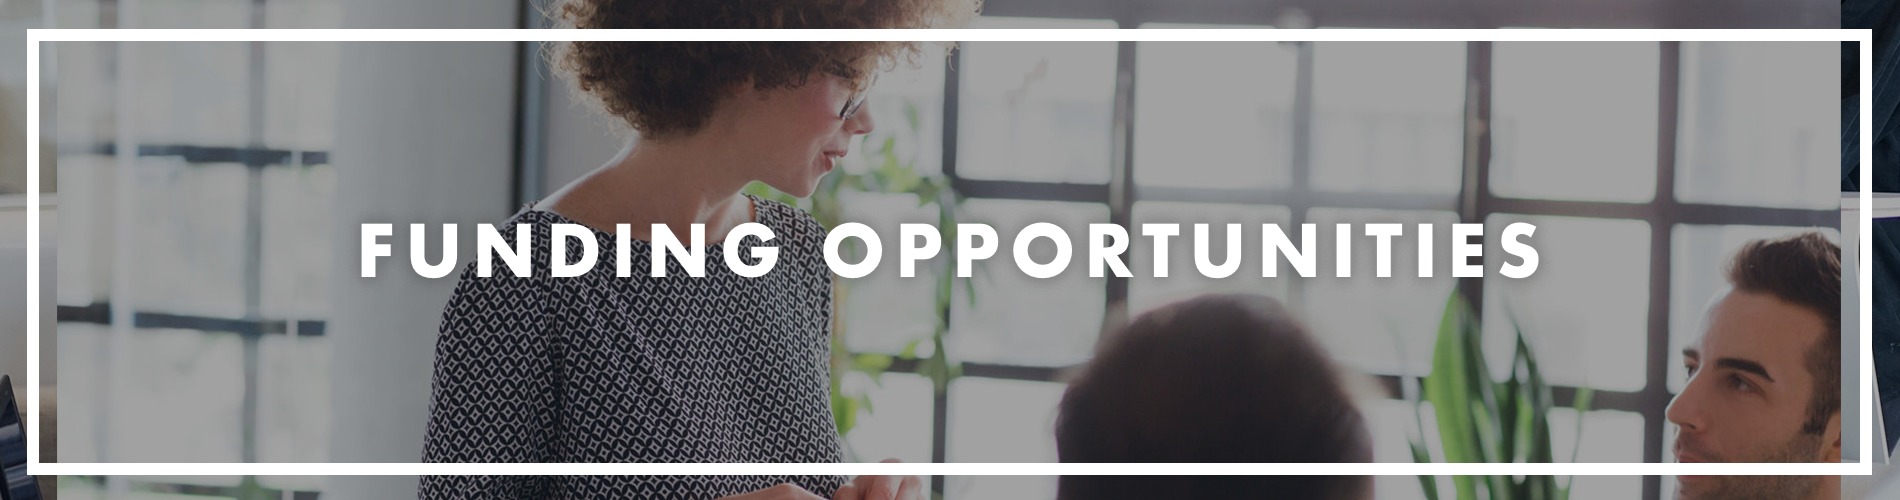 Funding Opportunities banner